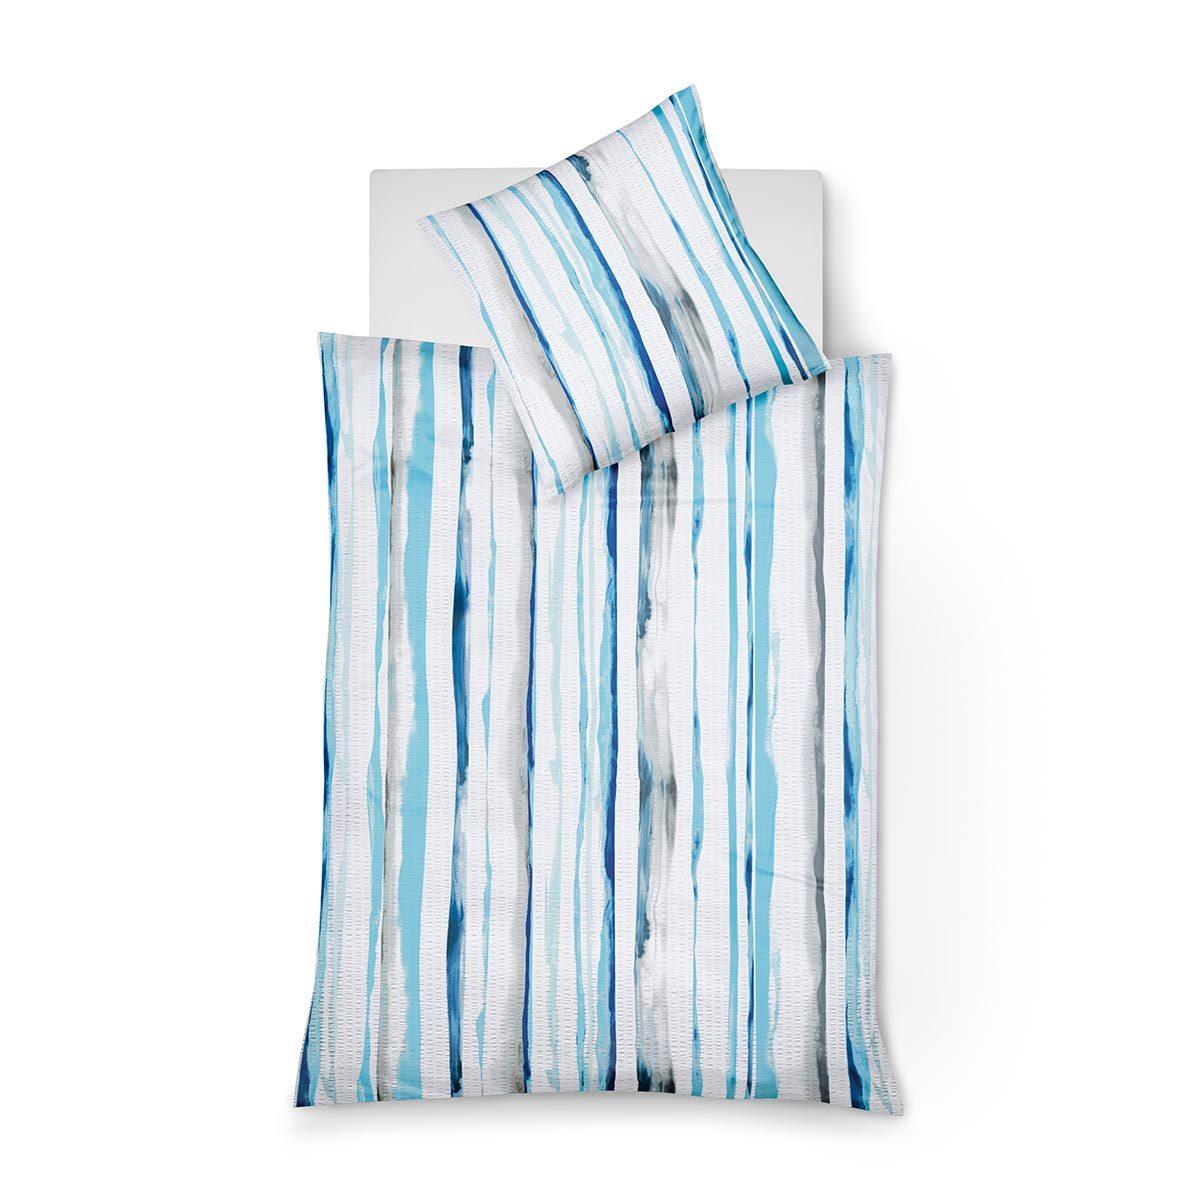 fleuresse seersucker bettw sche bali 493838 02 g nstig online kaufen bei bettwaren shop. Black Bedroom Furniture Sets. Home Design Ideas